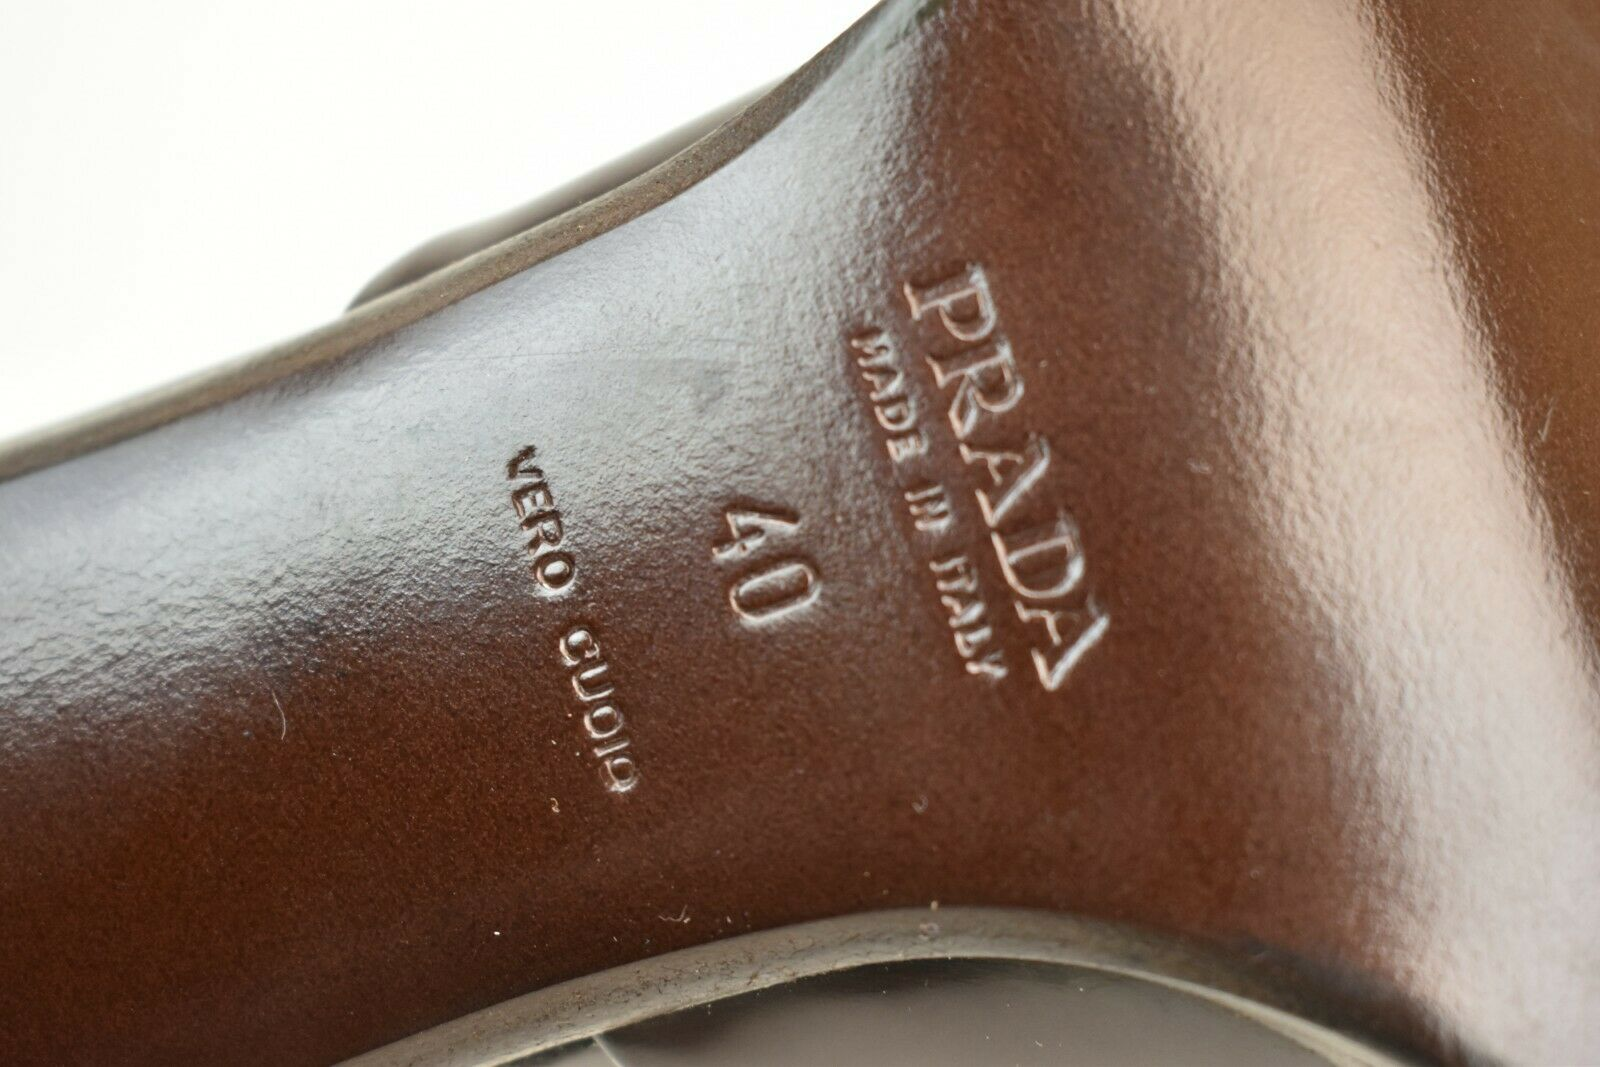 Prada Marron Chocolat Cuir Poli Cheville Sangle D'ORSAY classique classique classique Pompes 110 40 2aad7e